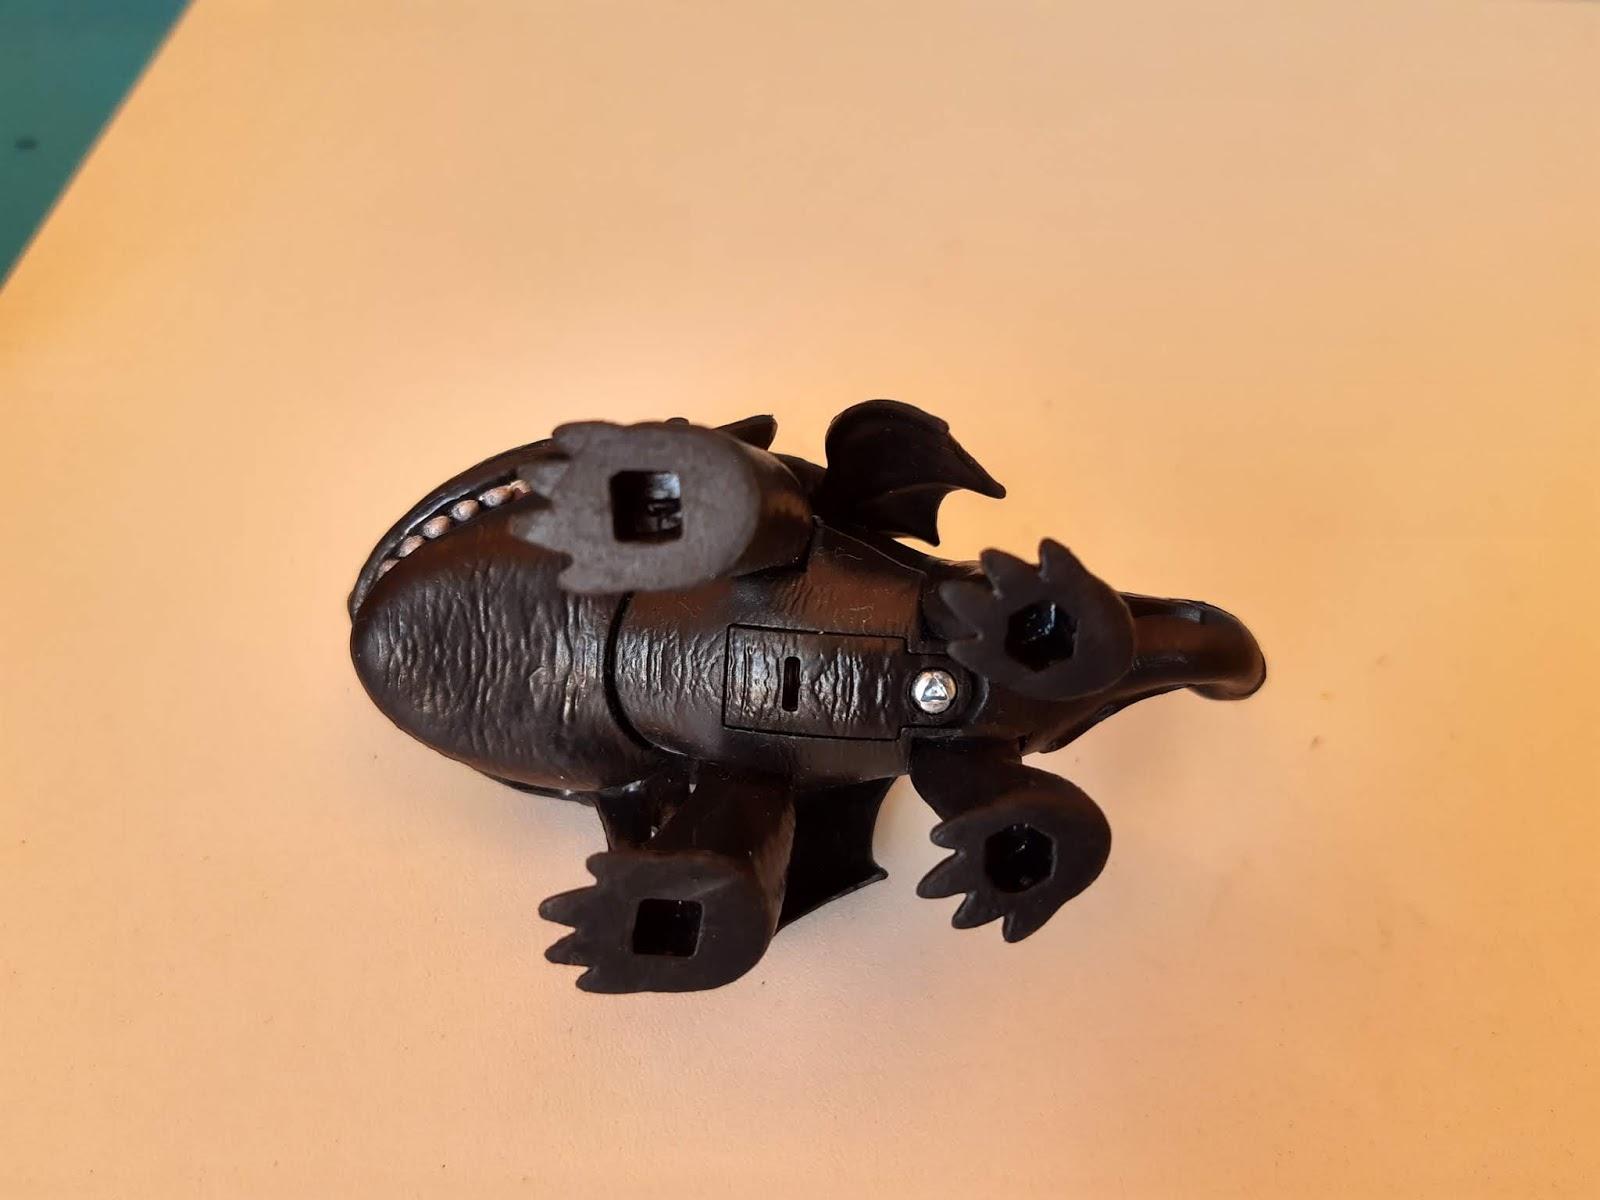 Taffy Shop Brecho De Brinquedos Miniatura De Vinil Estatica Do